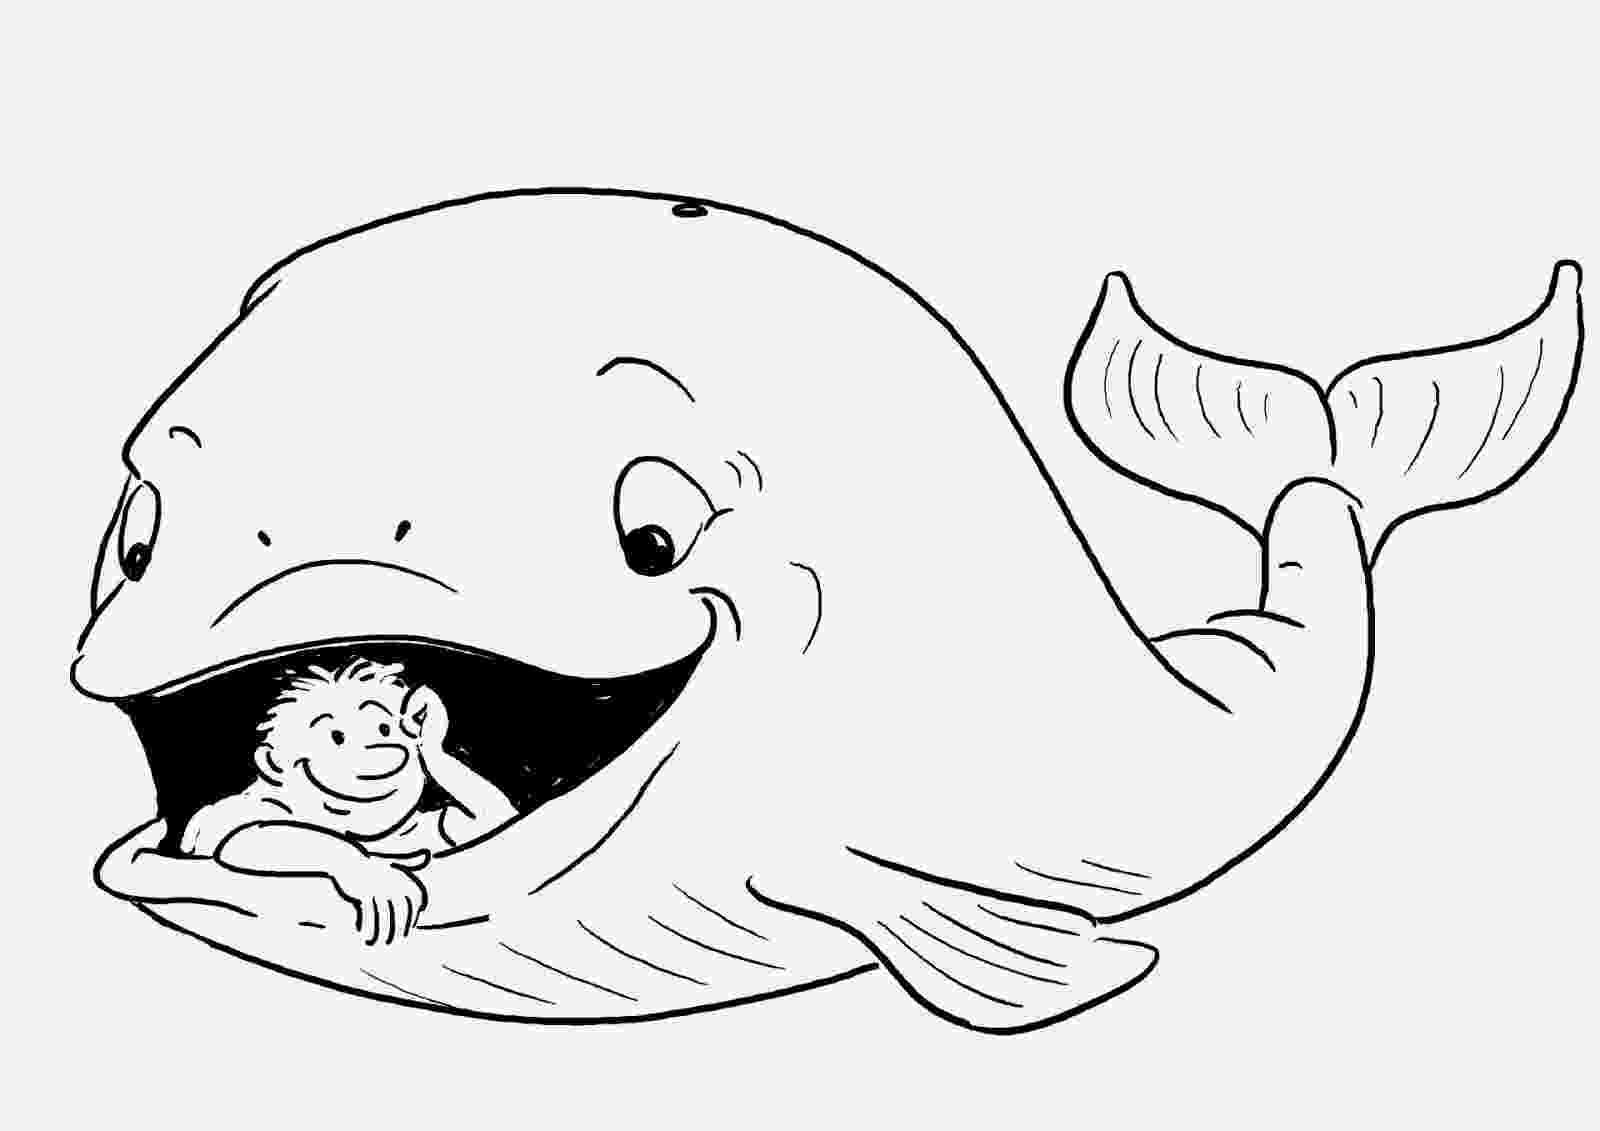 dibujos de jonas y la ballena imagenes cristianas para colorear dibujos para colorear de ballena y dibujos jonas la